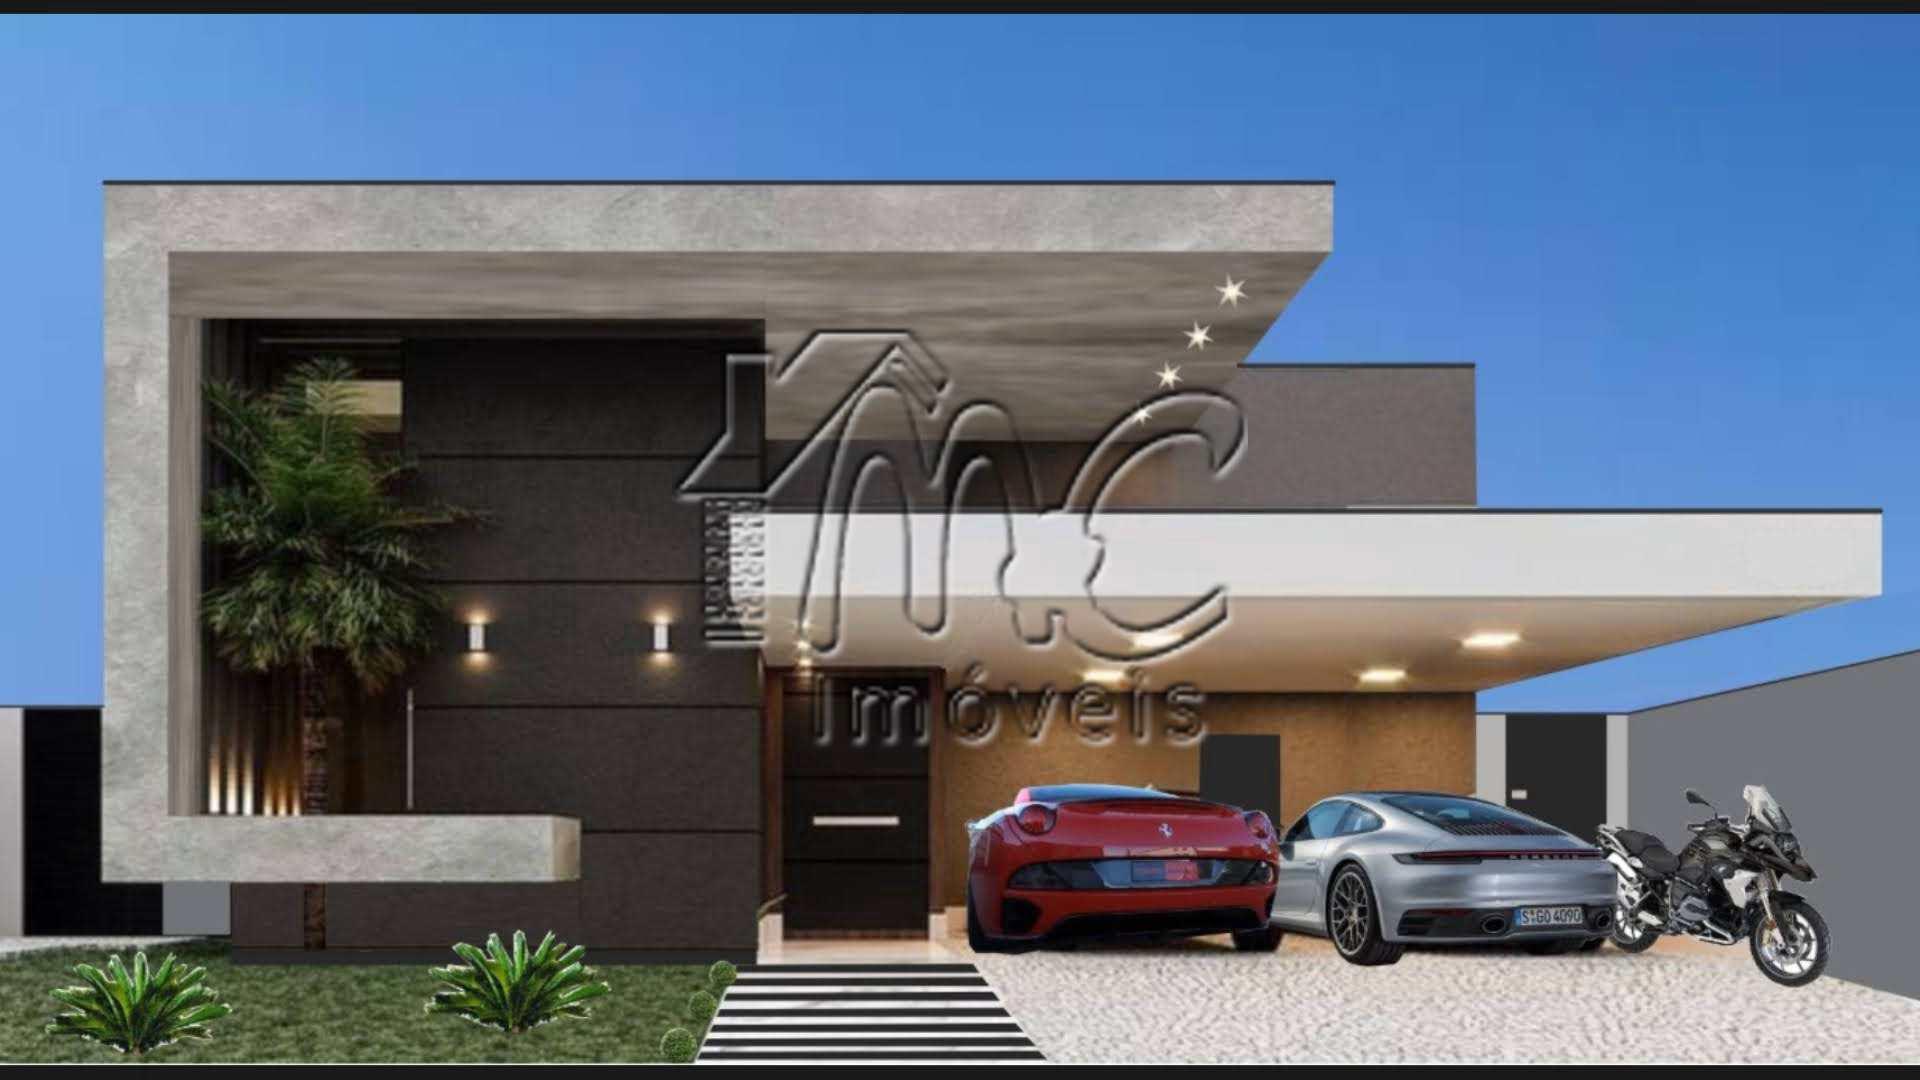 Casa de Condomínio com 4 dorms, Alphaville Nova Esplanada, Votorantim - R$ 2.2 mi, Cod: CA8784